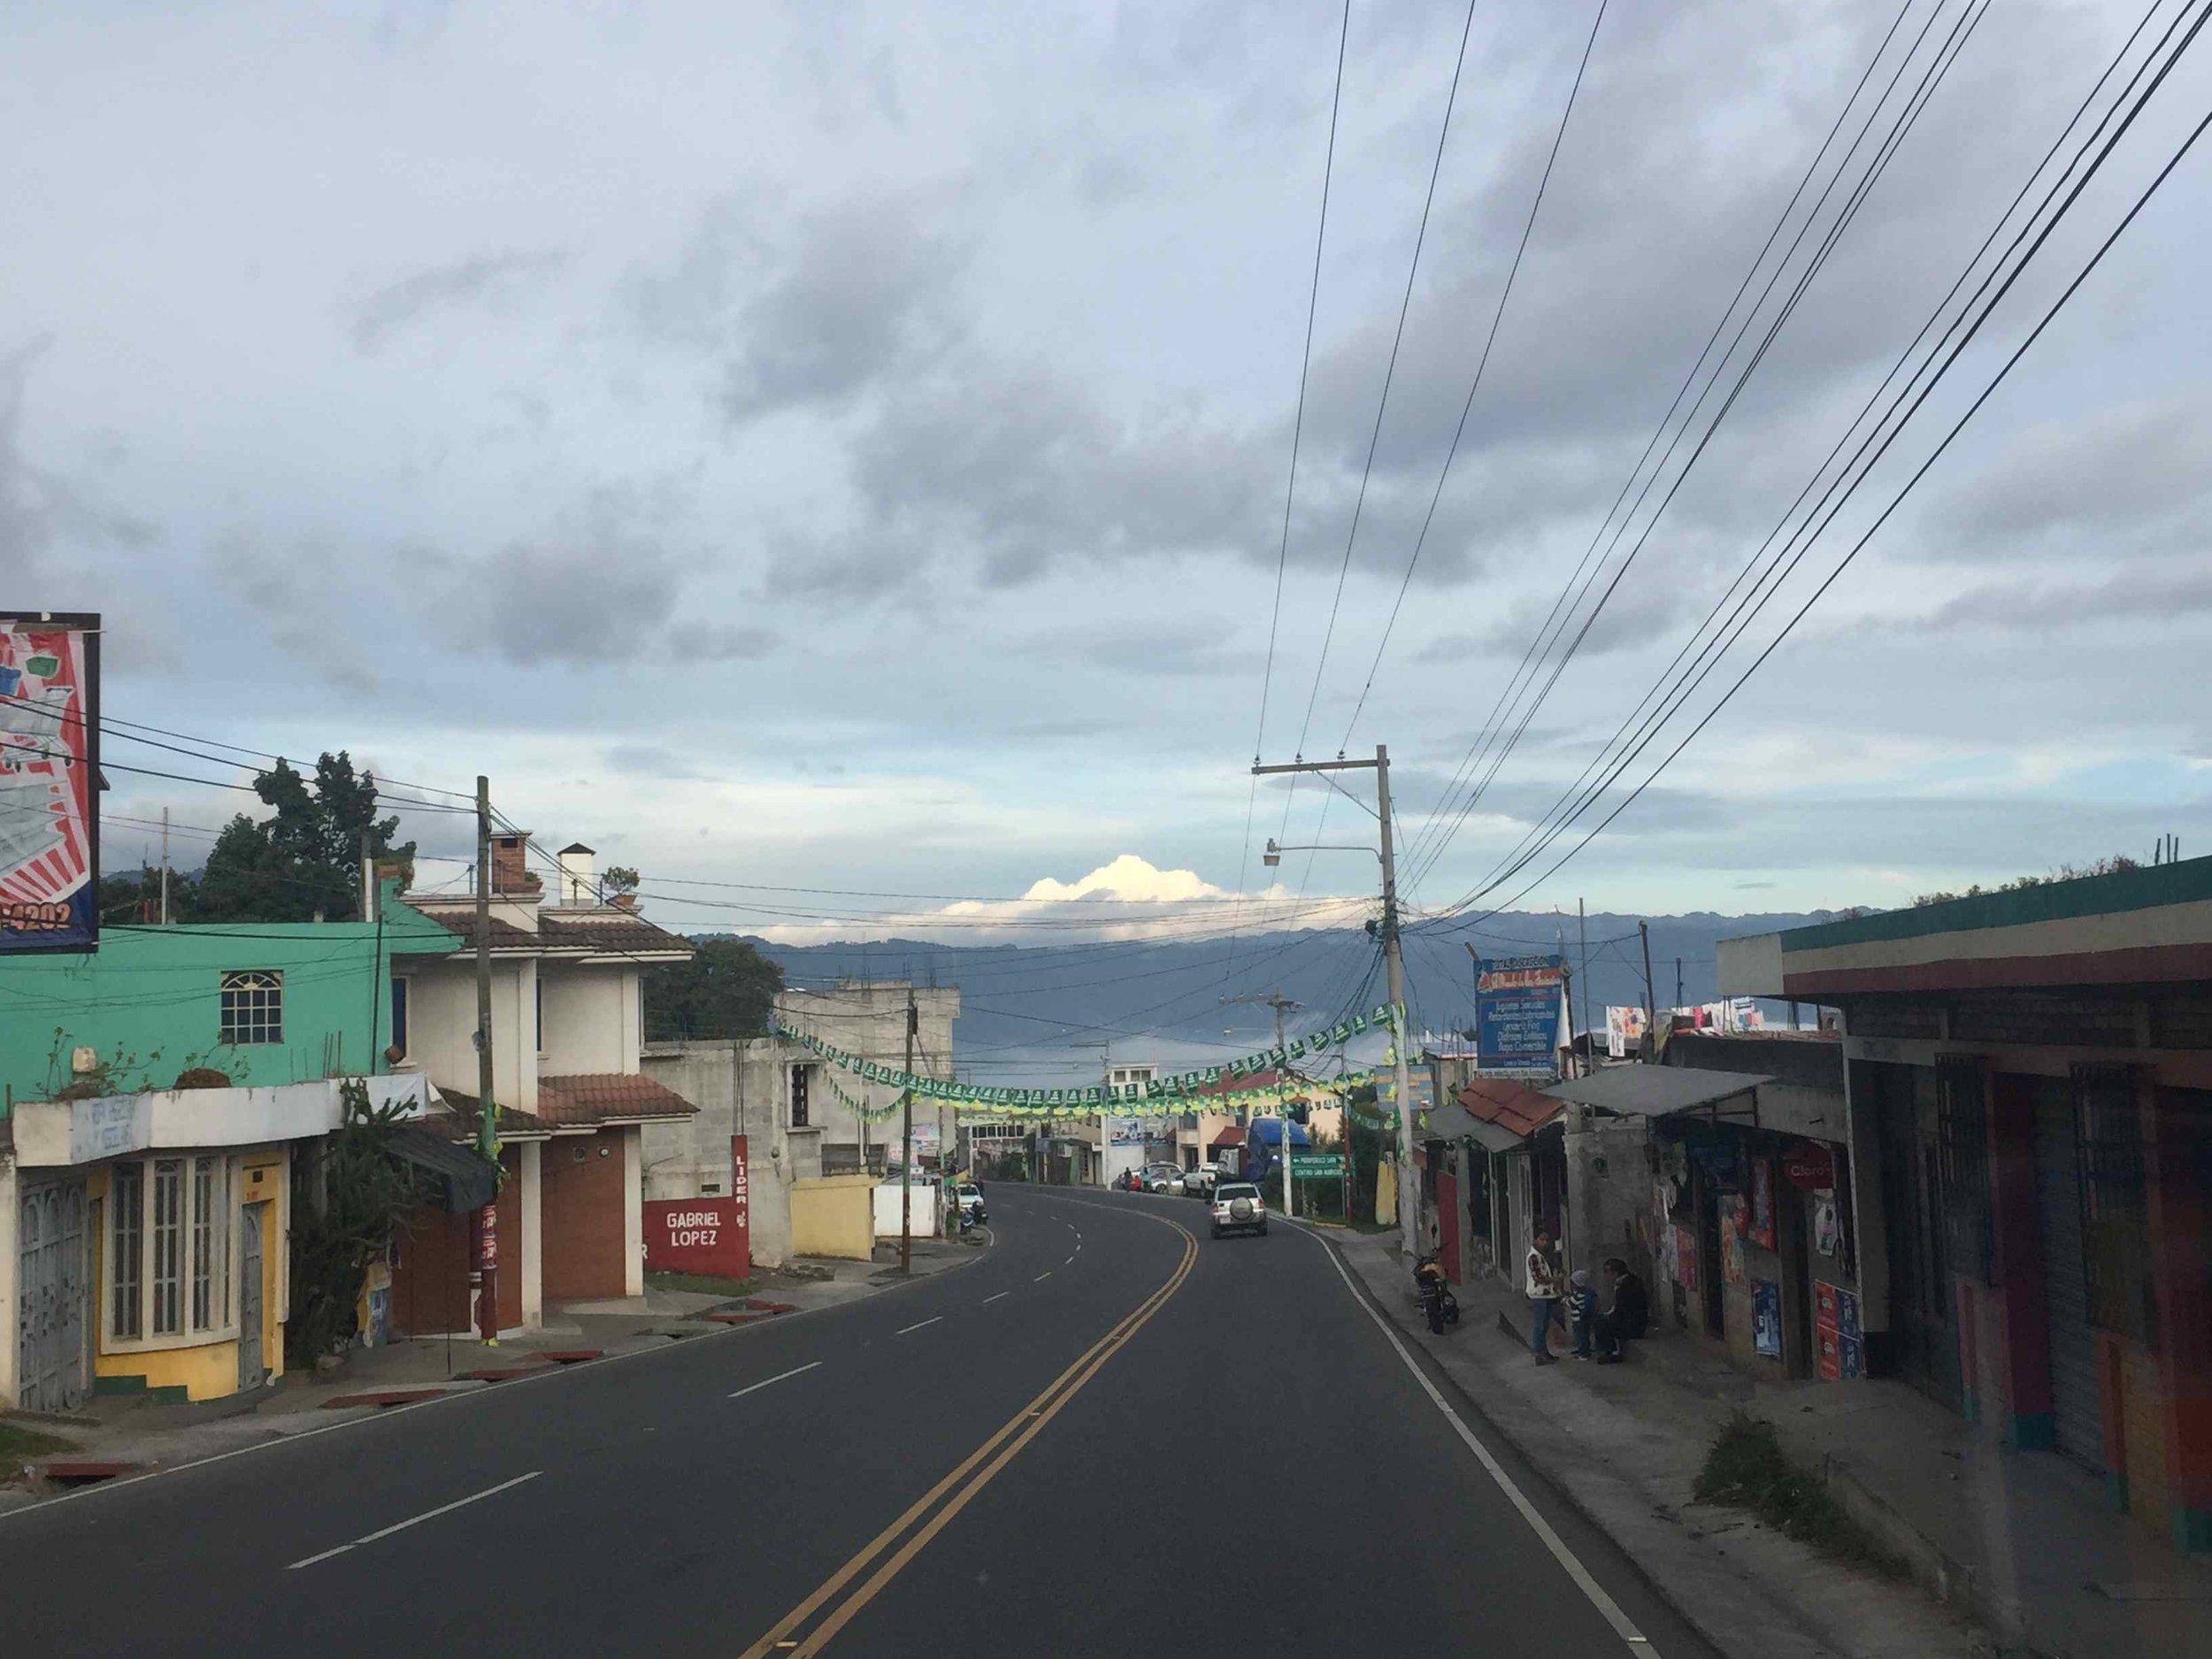 Heading towards Xela on the mountain HWY